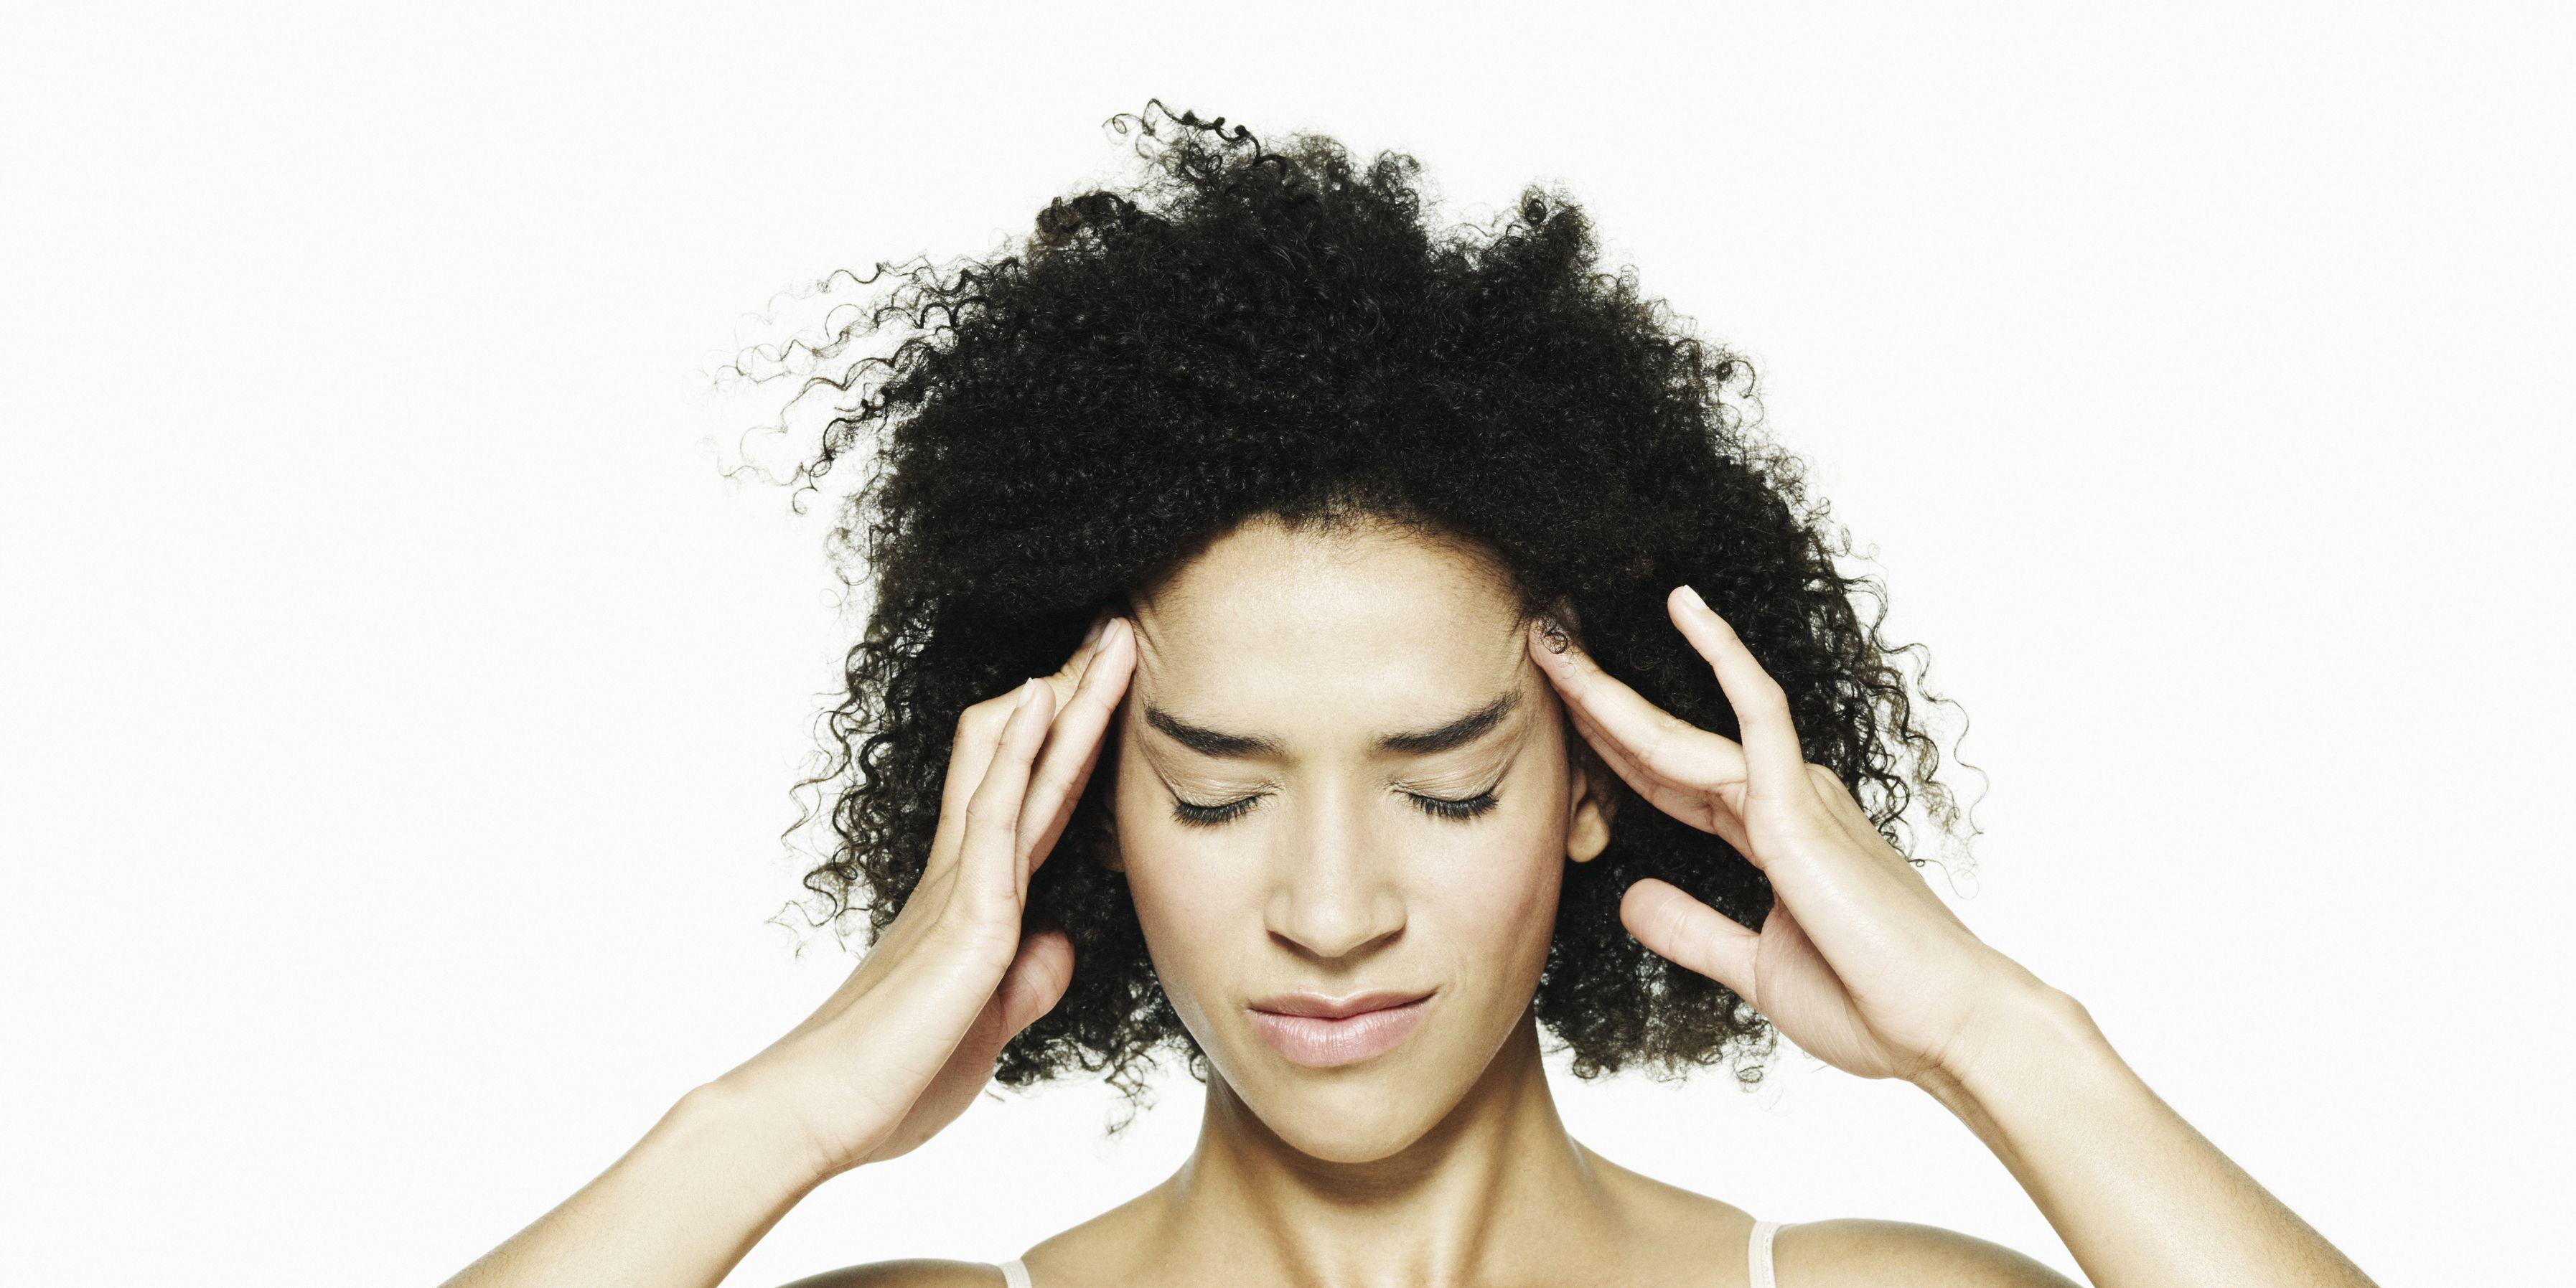 Portrait of woman with a headache